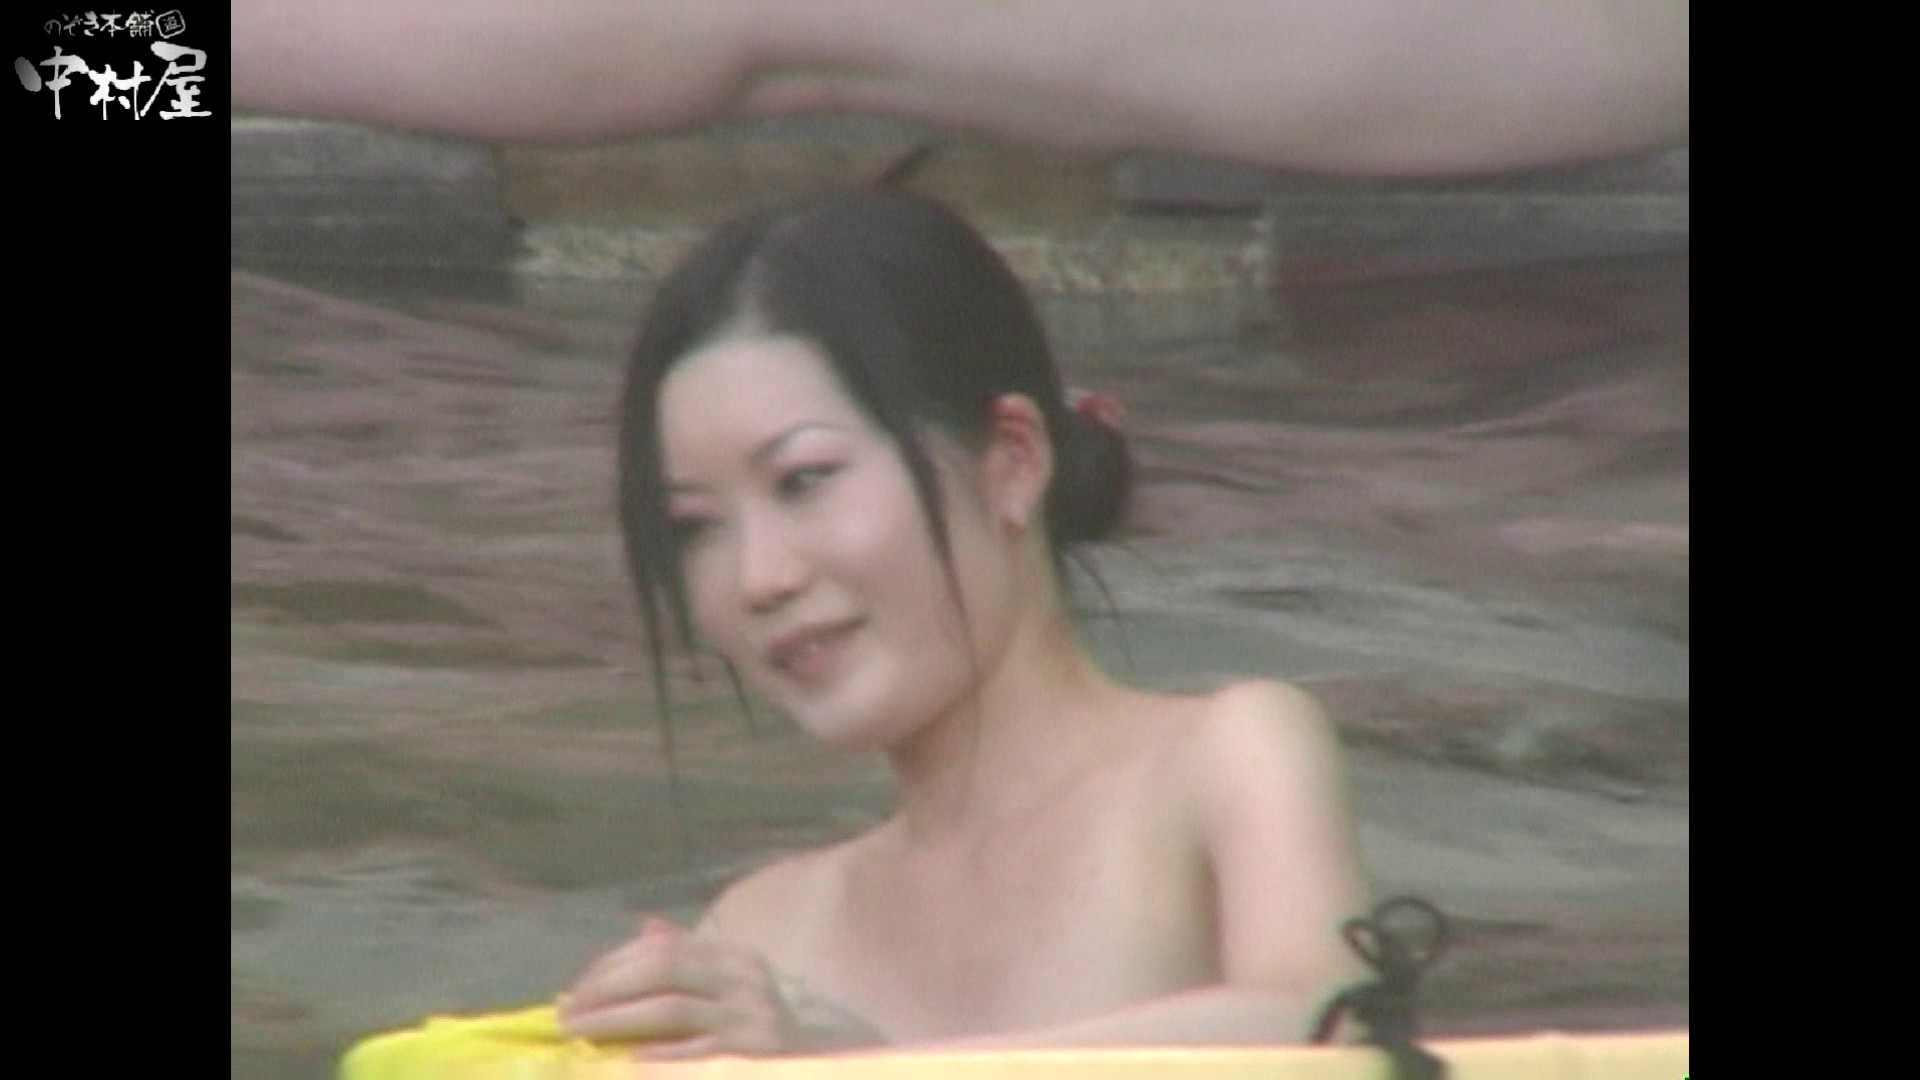 Aquaな露天風呂Vol.940 OLセックス | 露天  98画像 1